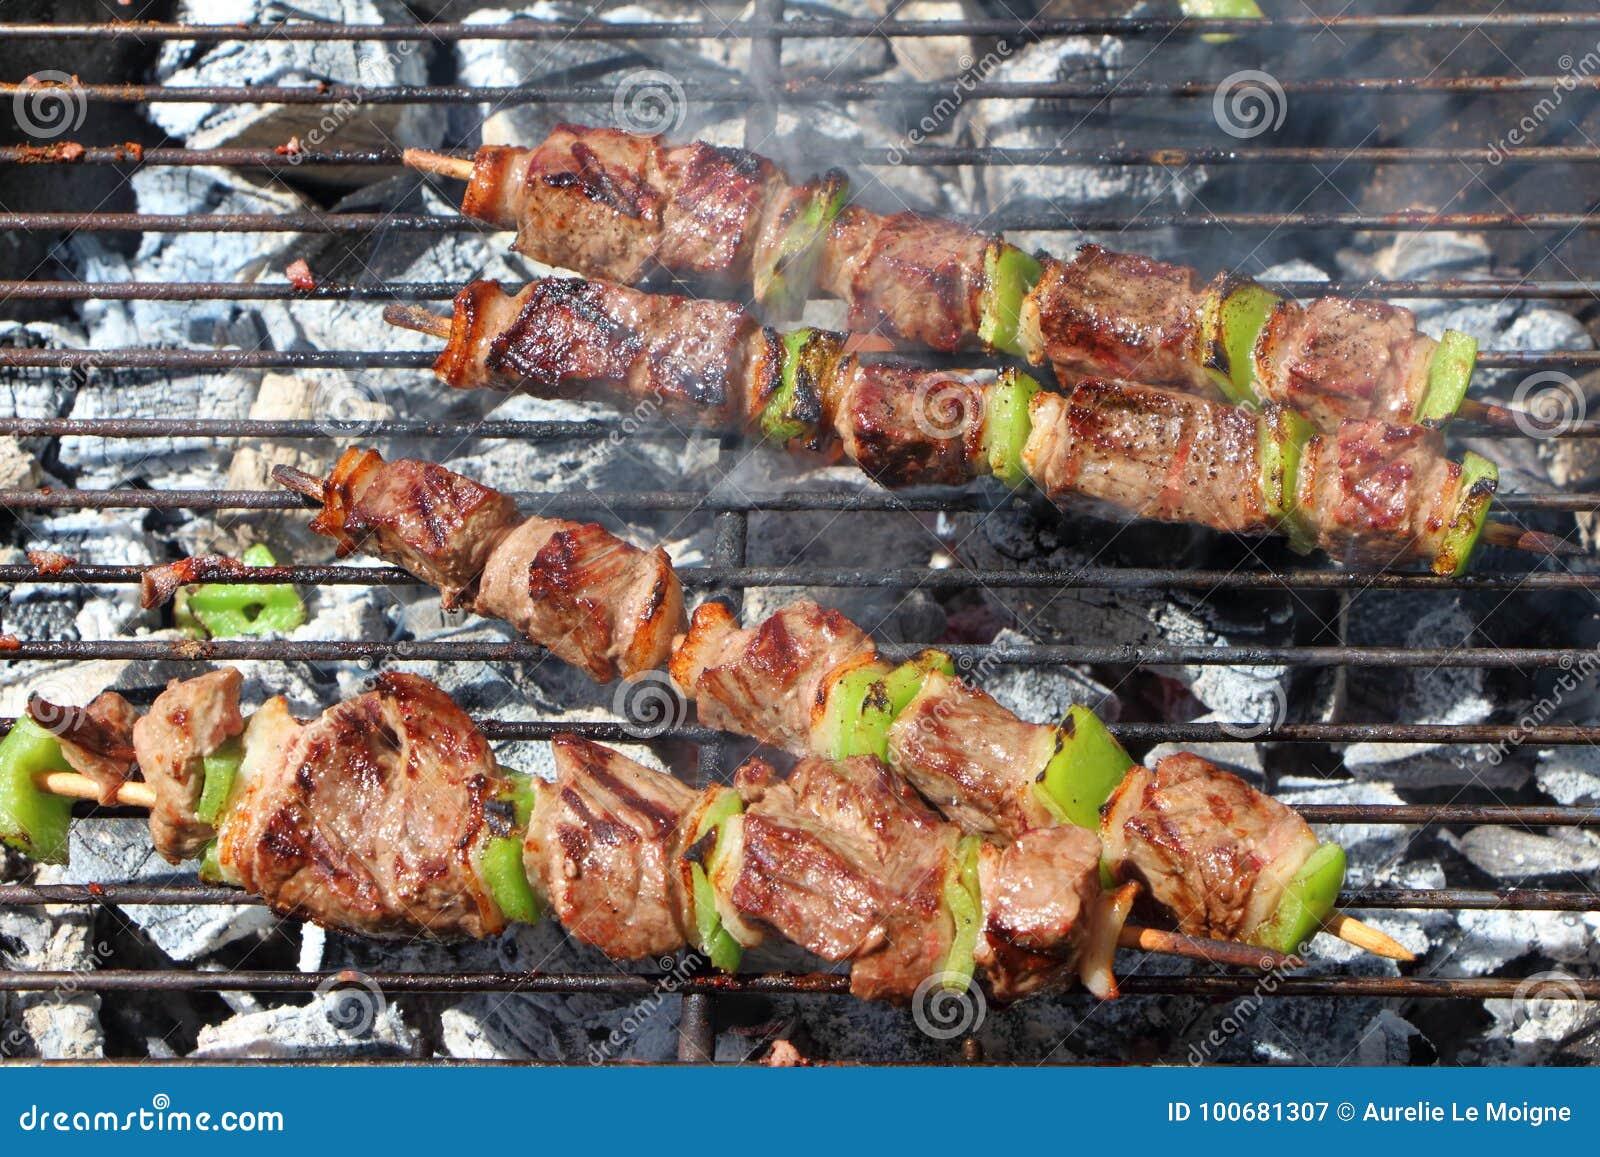 Rundvleesbrochette op barbecue